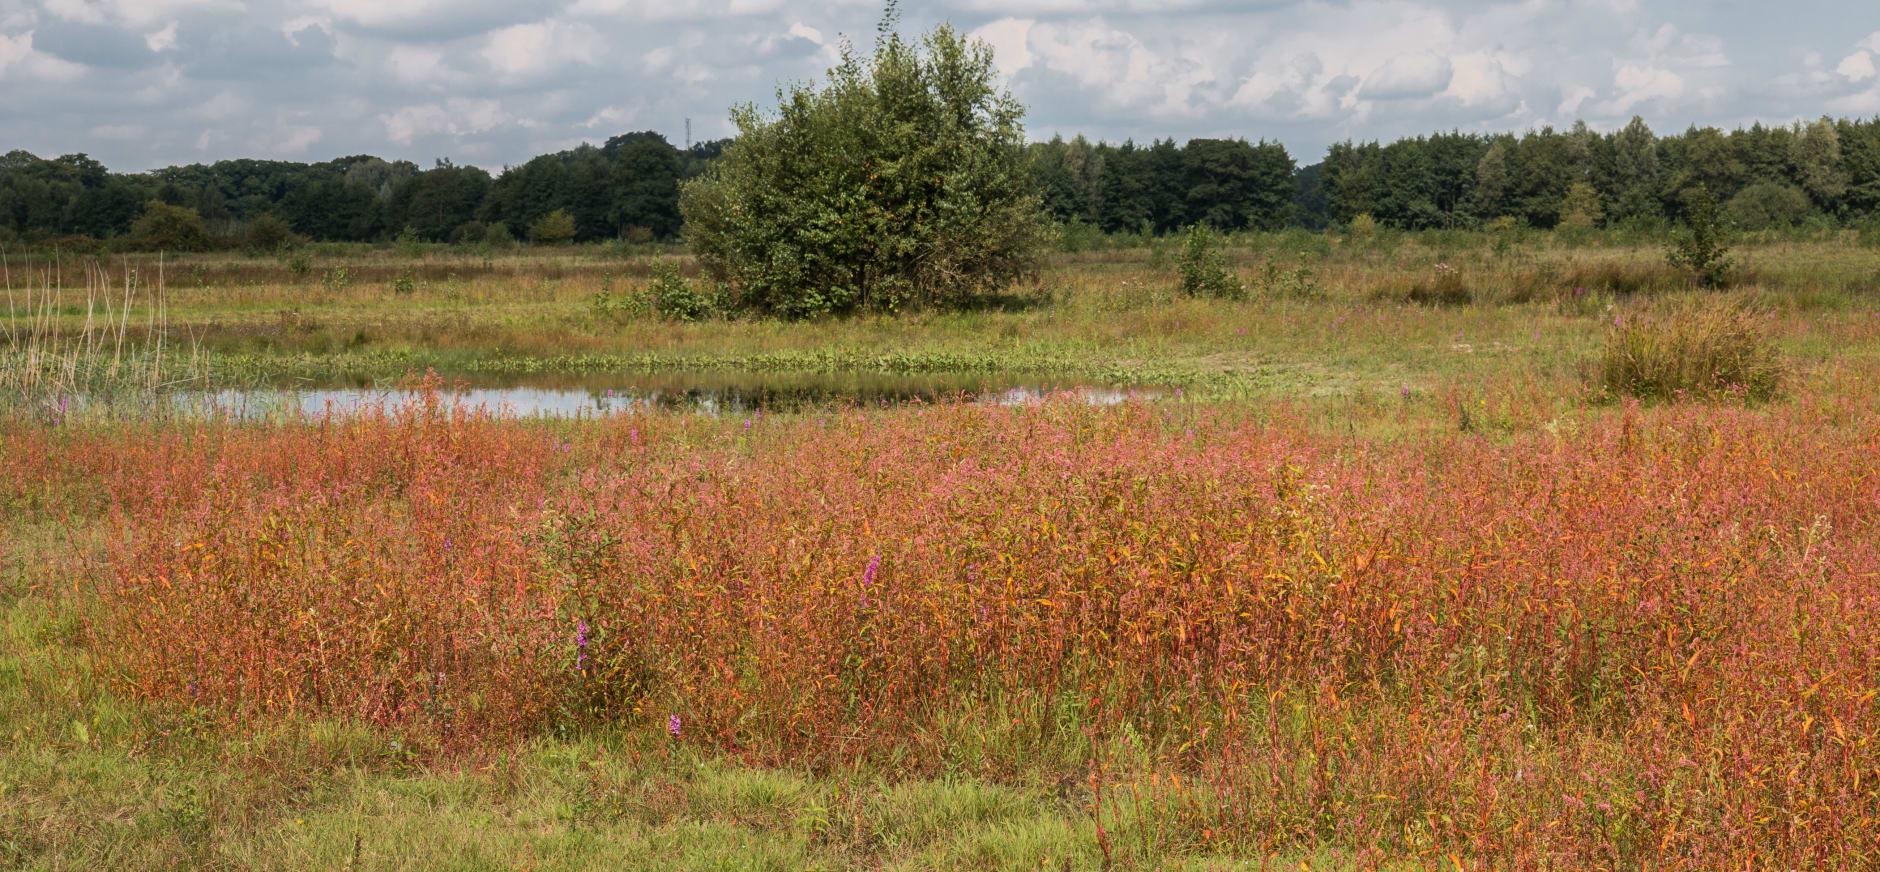 Soerense Broek, jonge natuurgebied in ontwikkeling